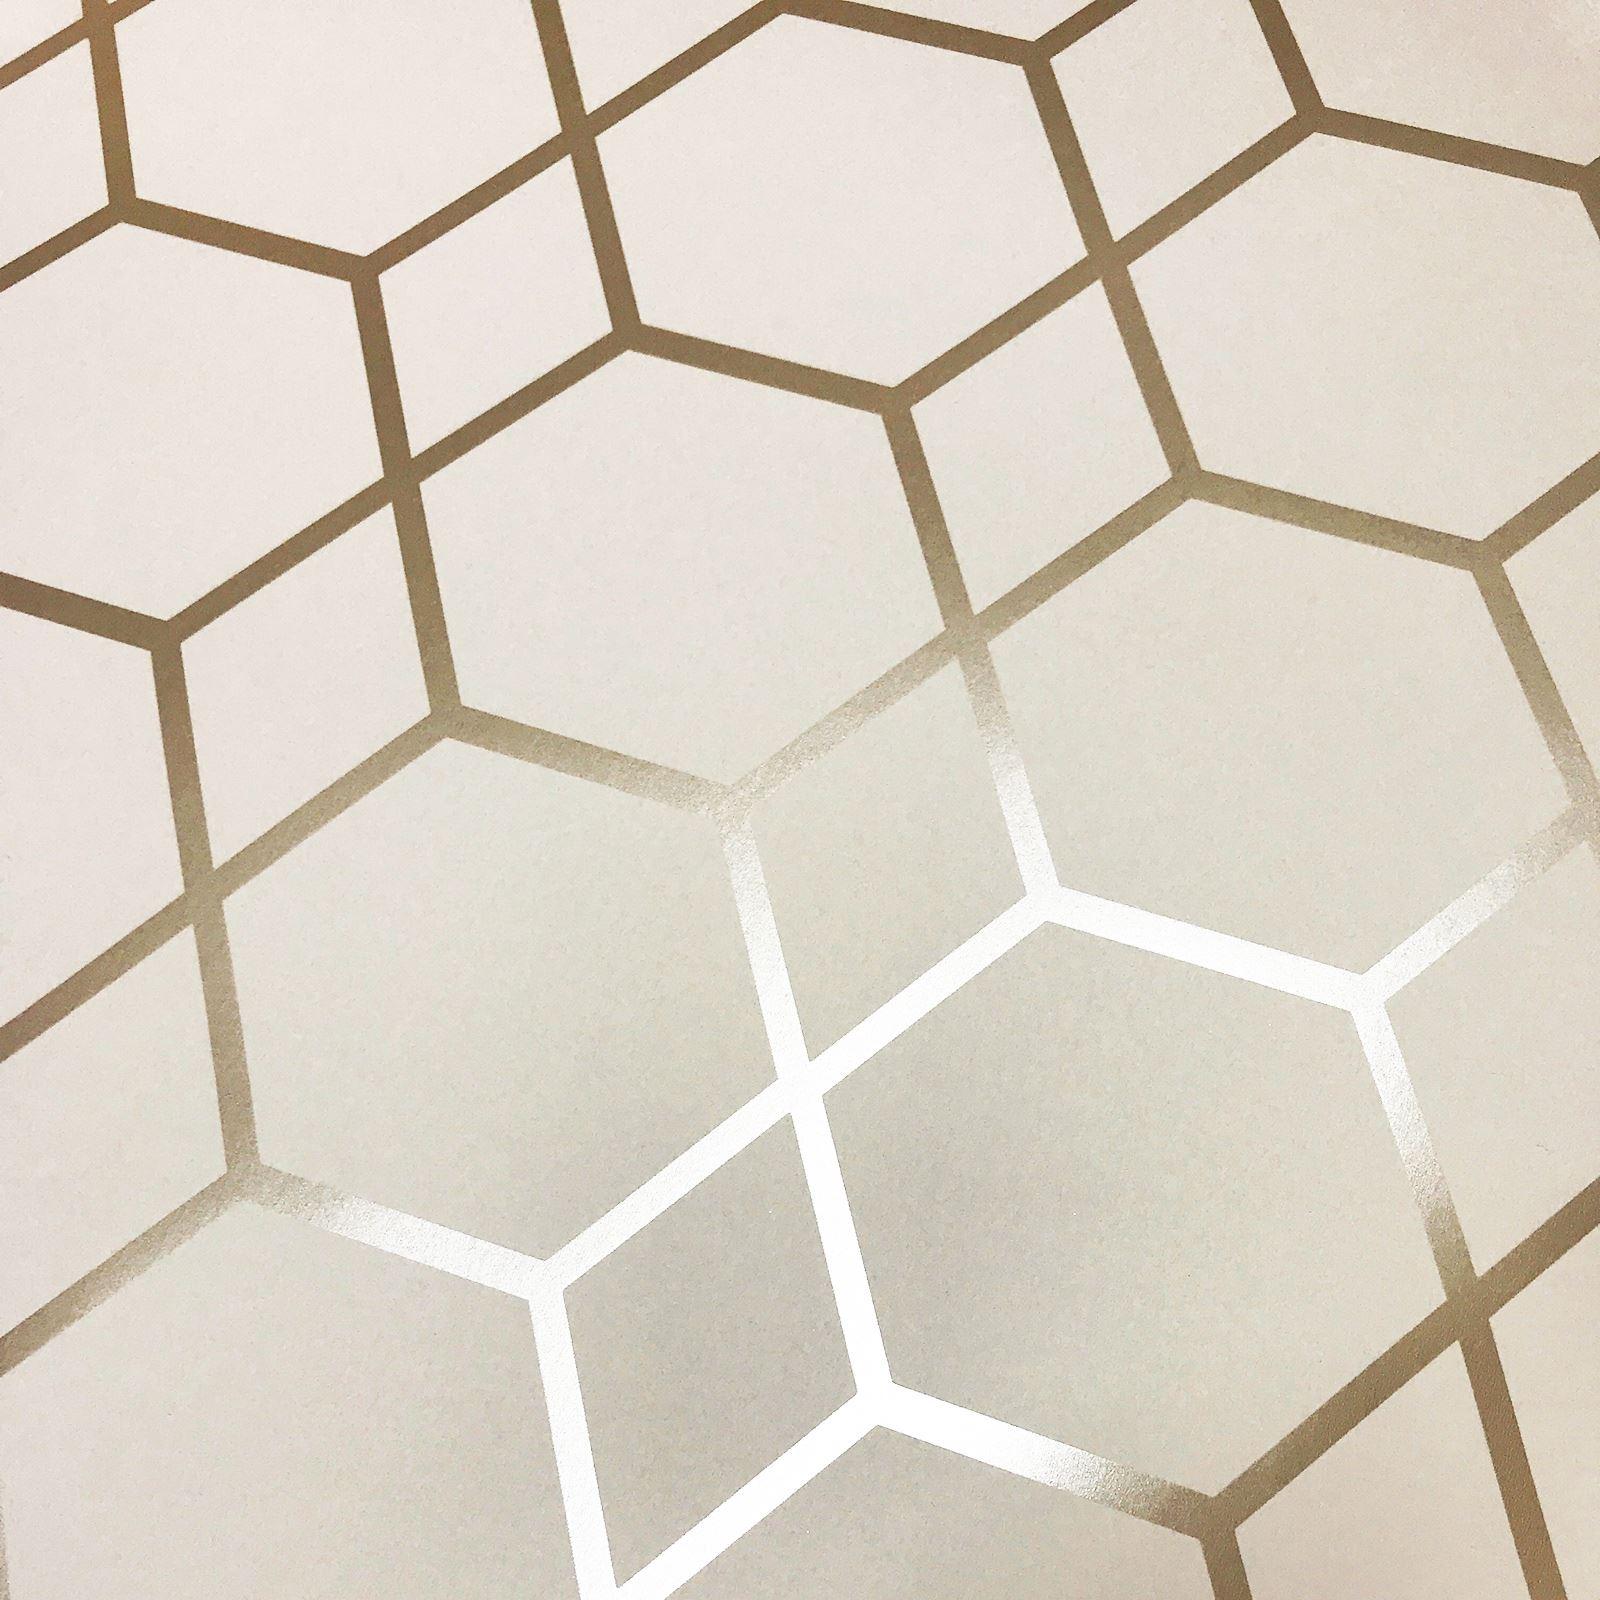 miniatura 22 - Carta da Parati Geometrica Arredamento Camera Moderno Vari Disegni e Colori